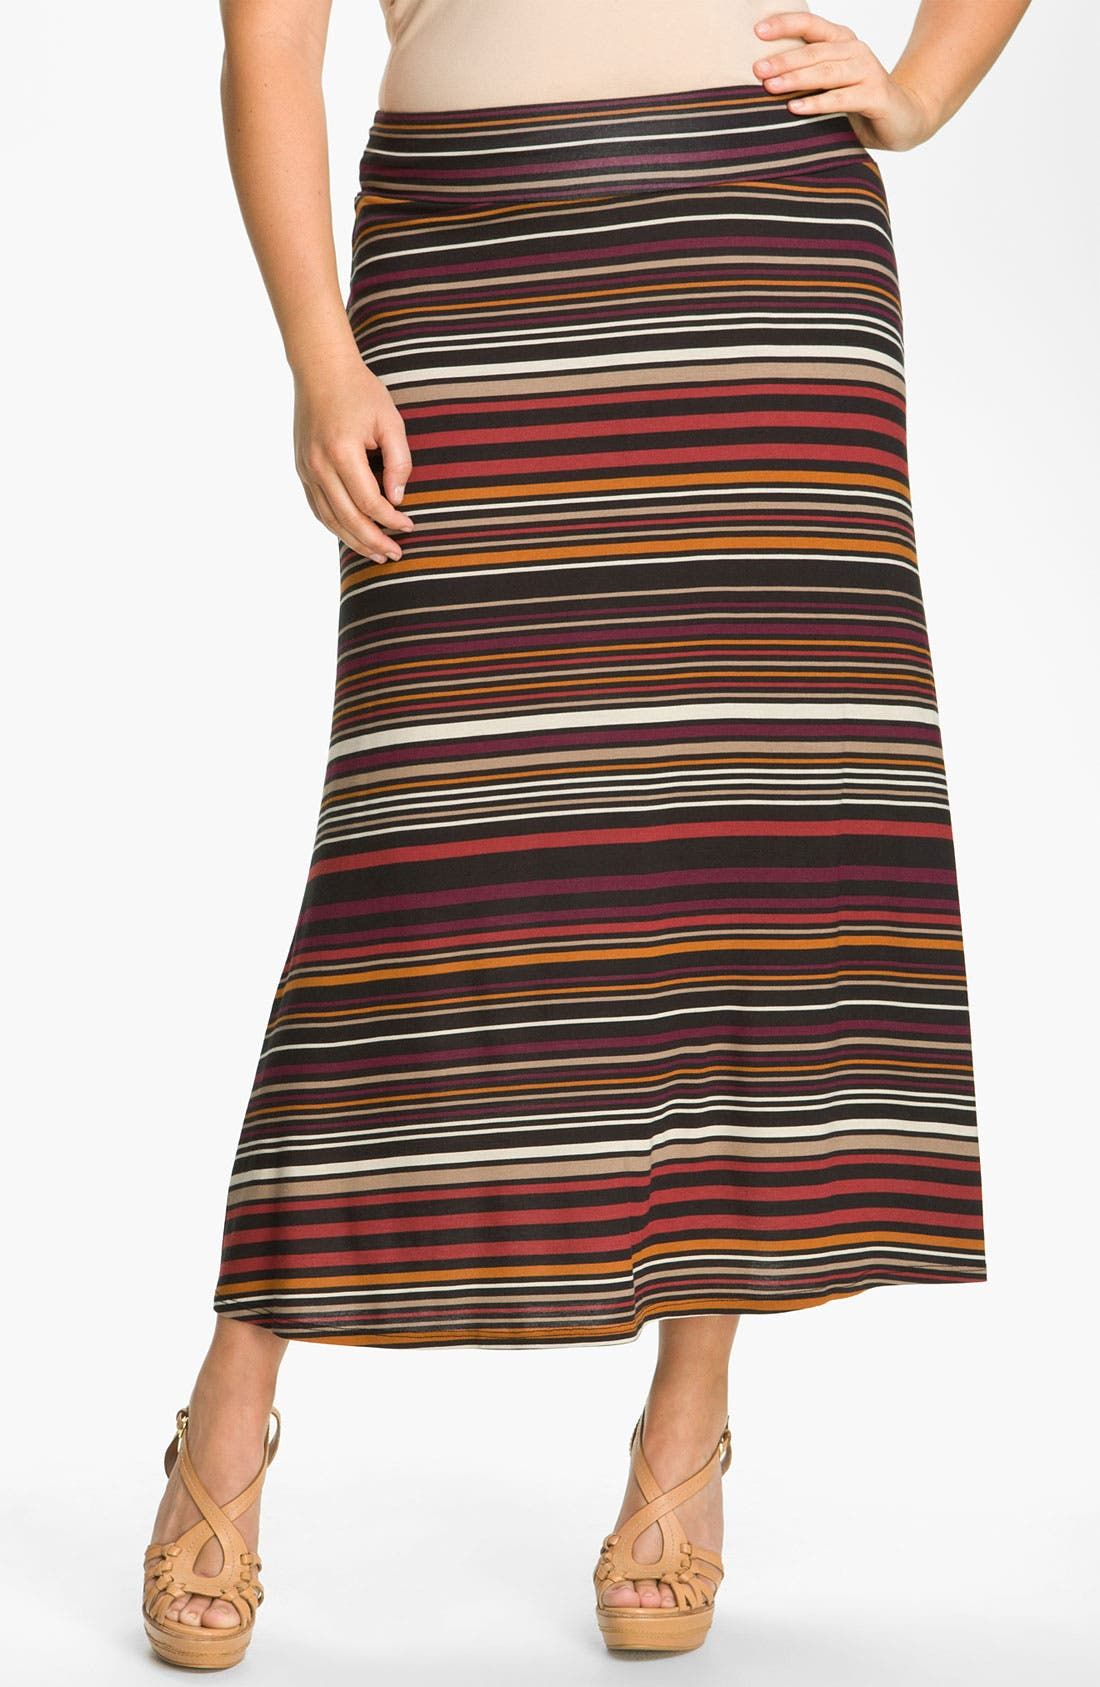 Alternate Image 1 Selected - Karen Kane Stripe Maxi Skirt (Plus)